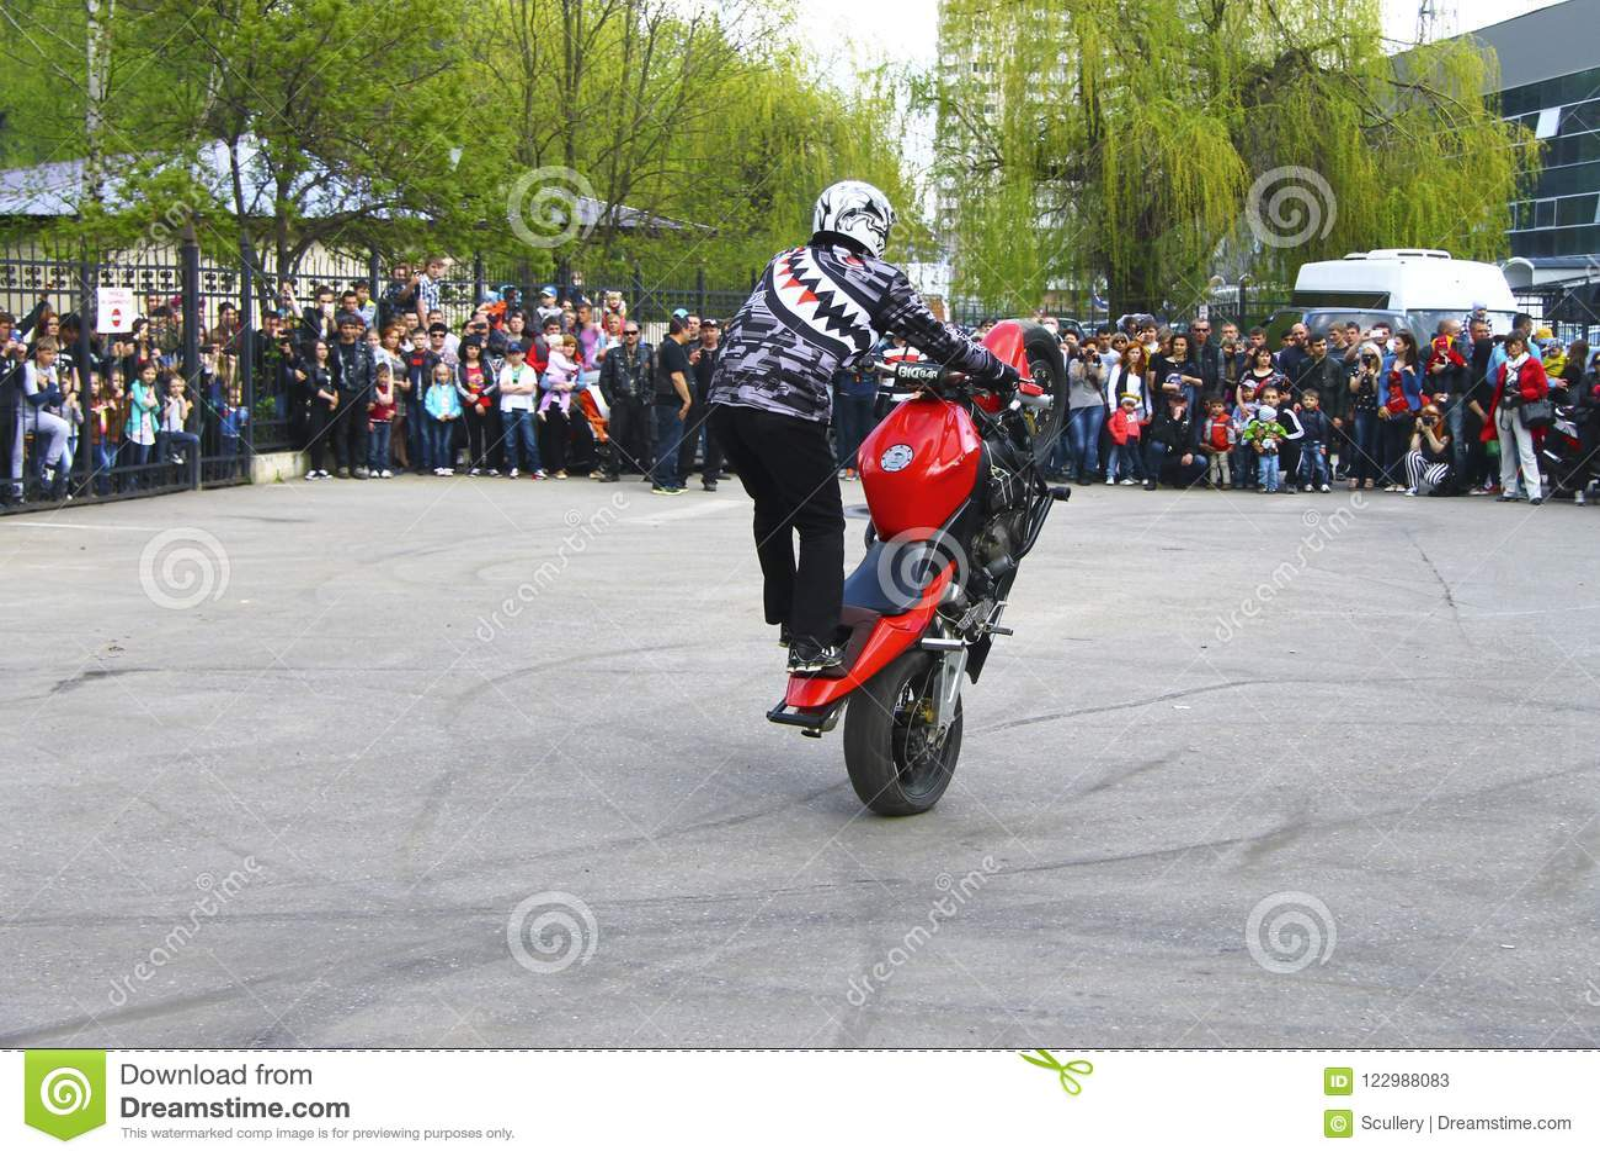 Motofree moto free style pilot stunting on the square - pyatigorsk russia